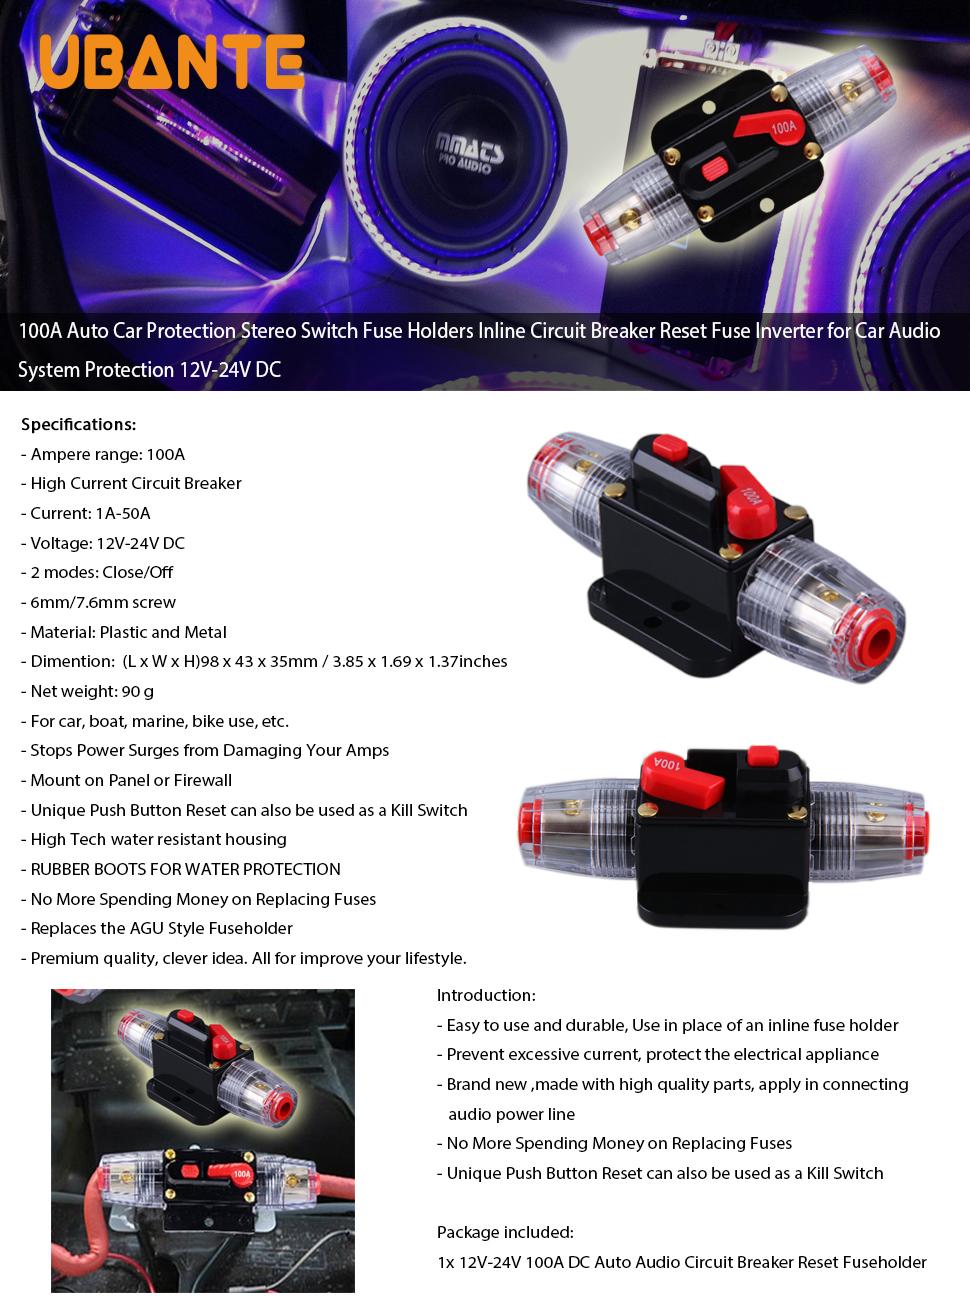 Ubante 100a Auto Car Protection Stereo Switch Fuse Automotive Circuit Breaker Reset Product Description